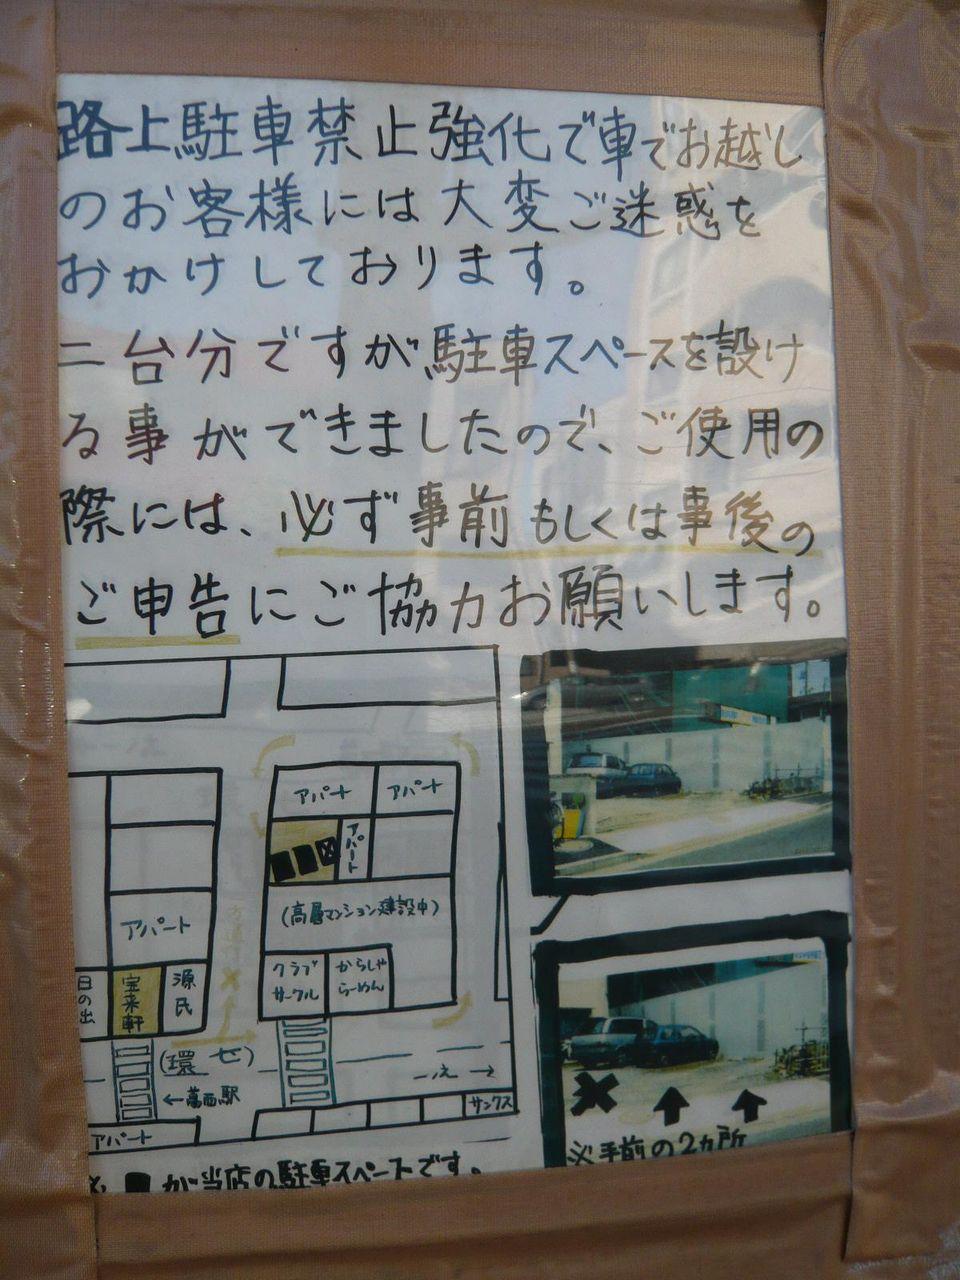 宝来軒の駐車場案内図